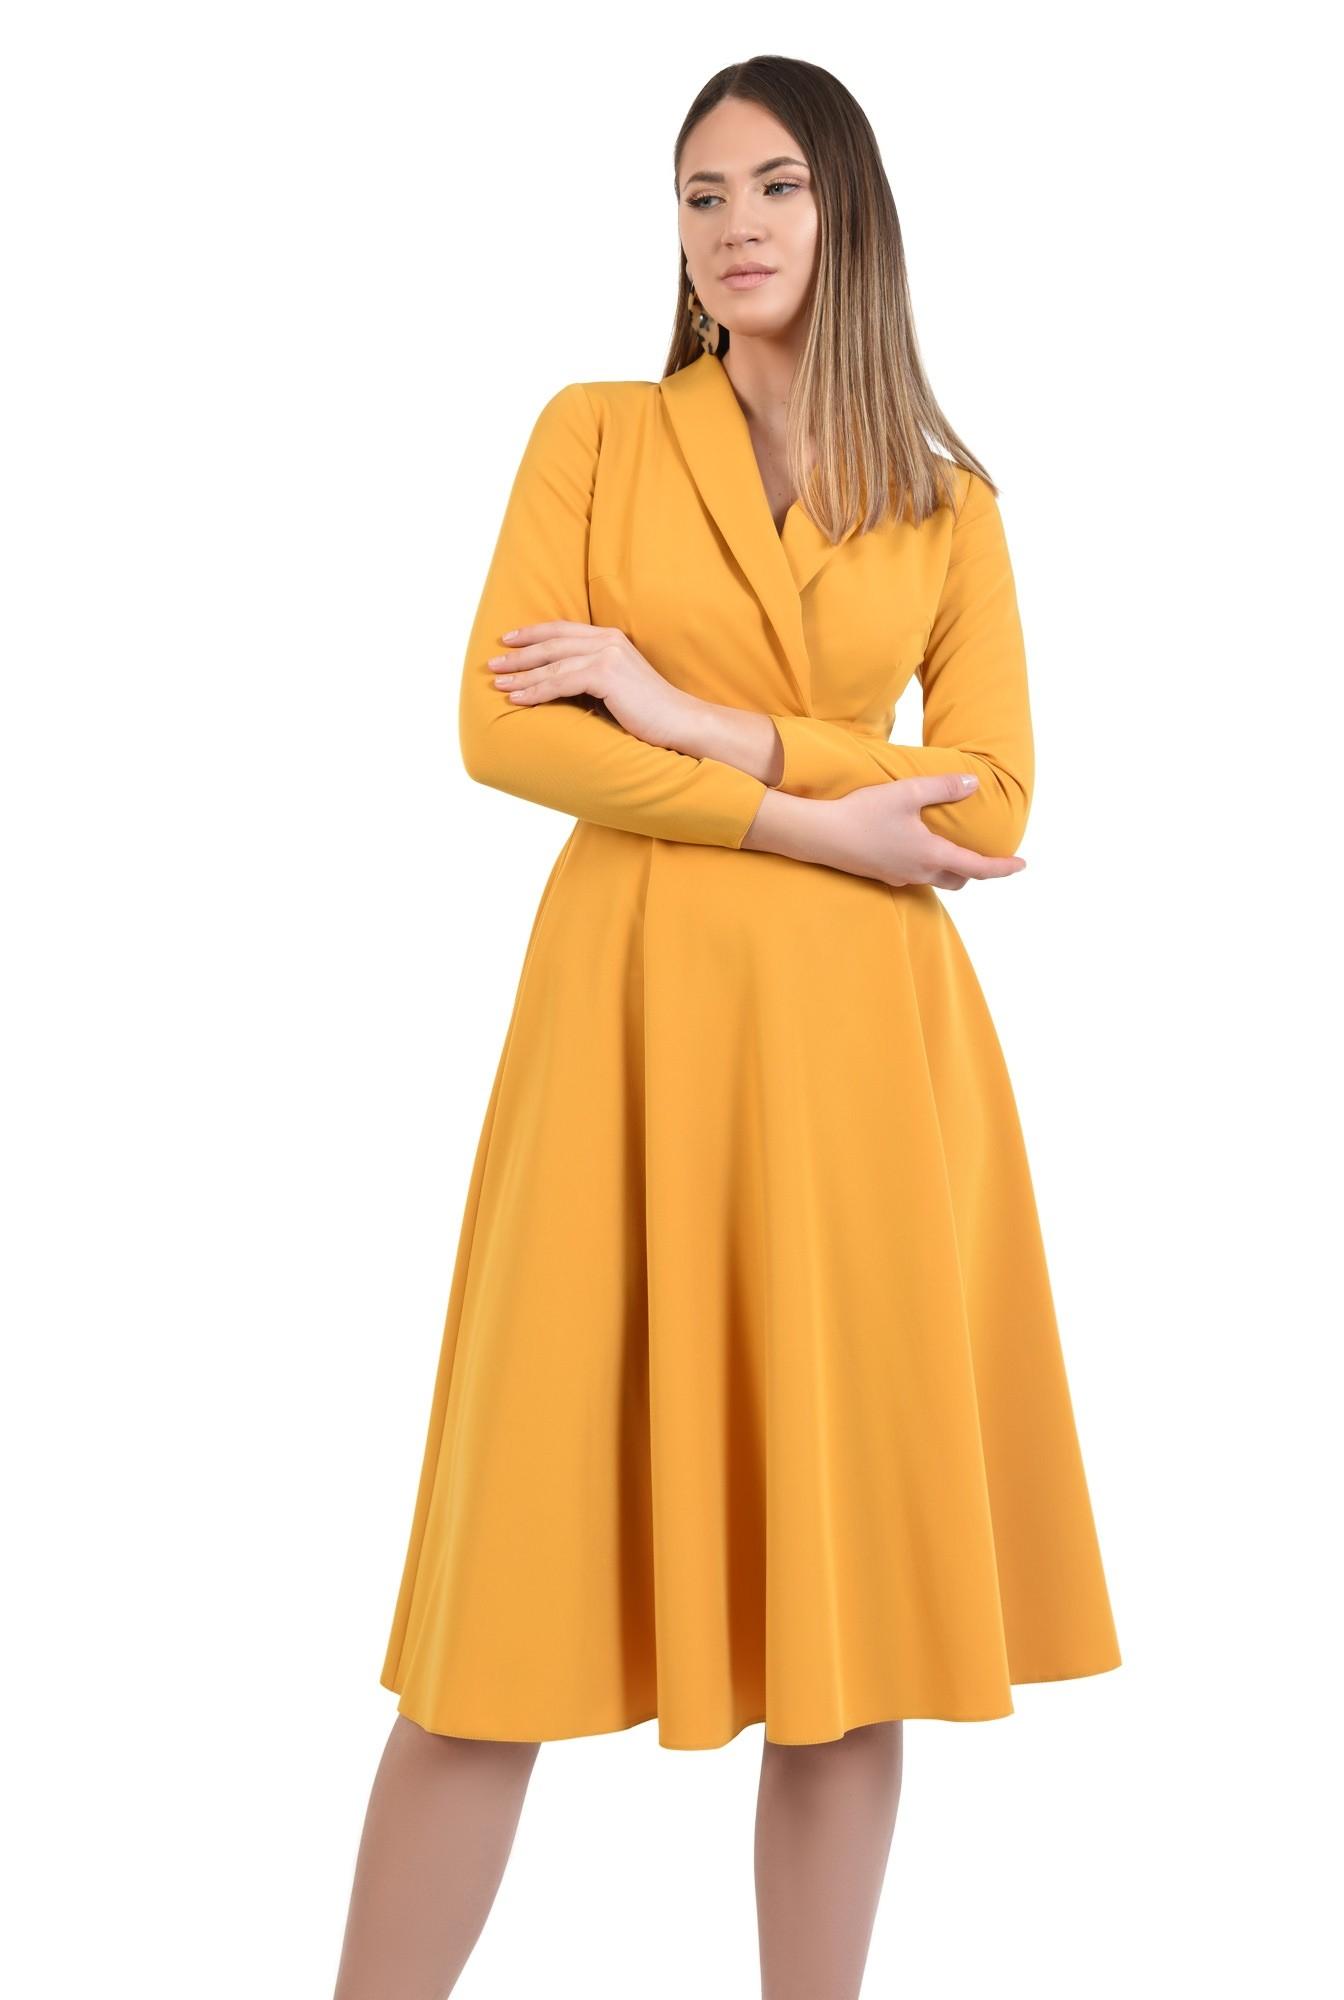 rochie eleganta, de zi, mustar, maneci ajustate, anchior petrecut